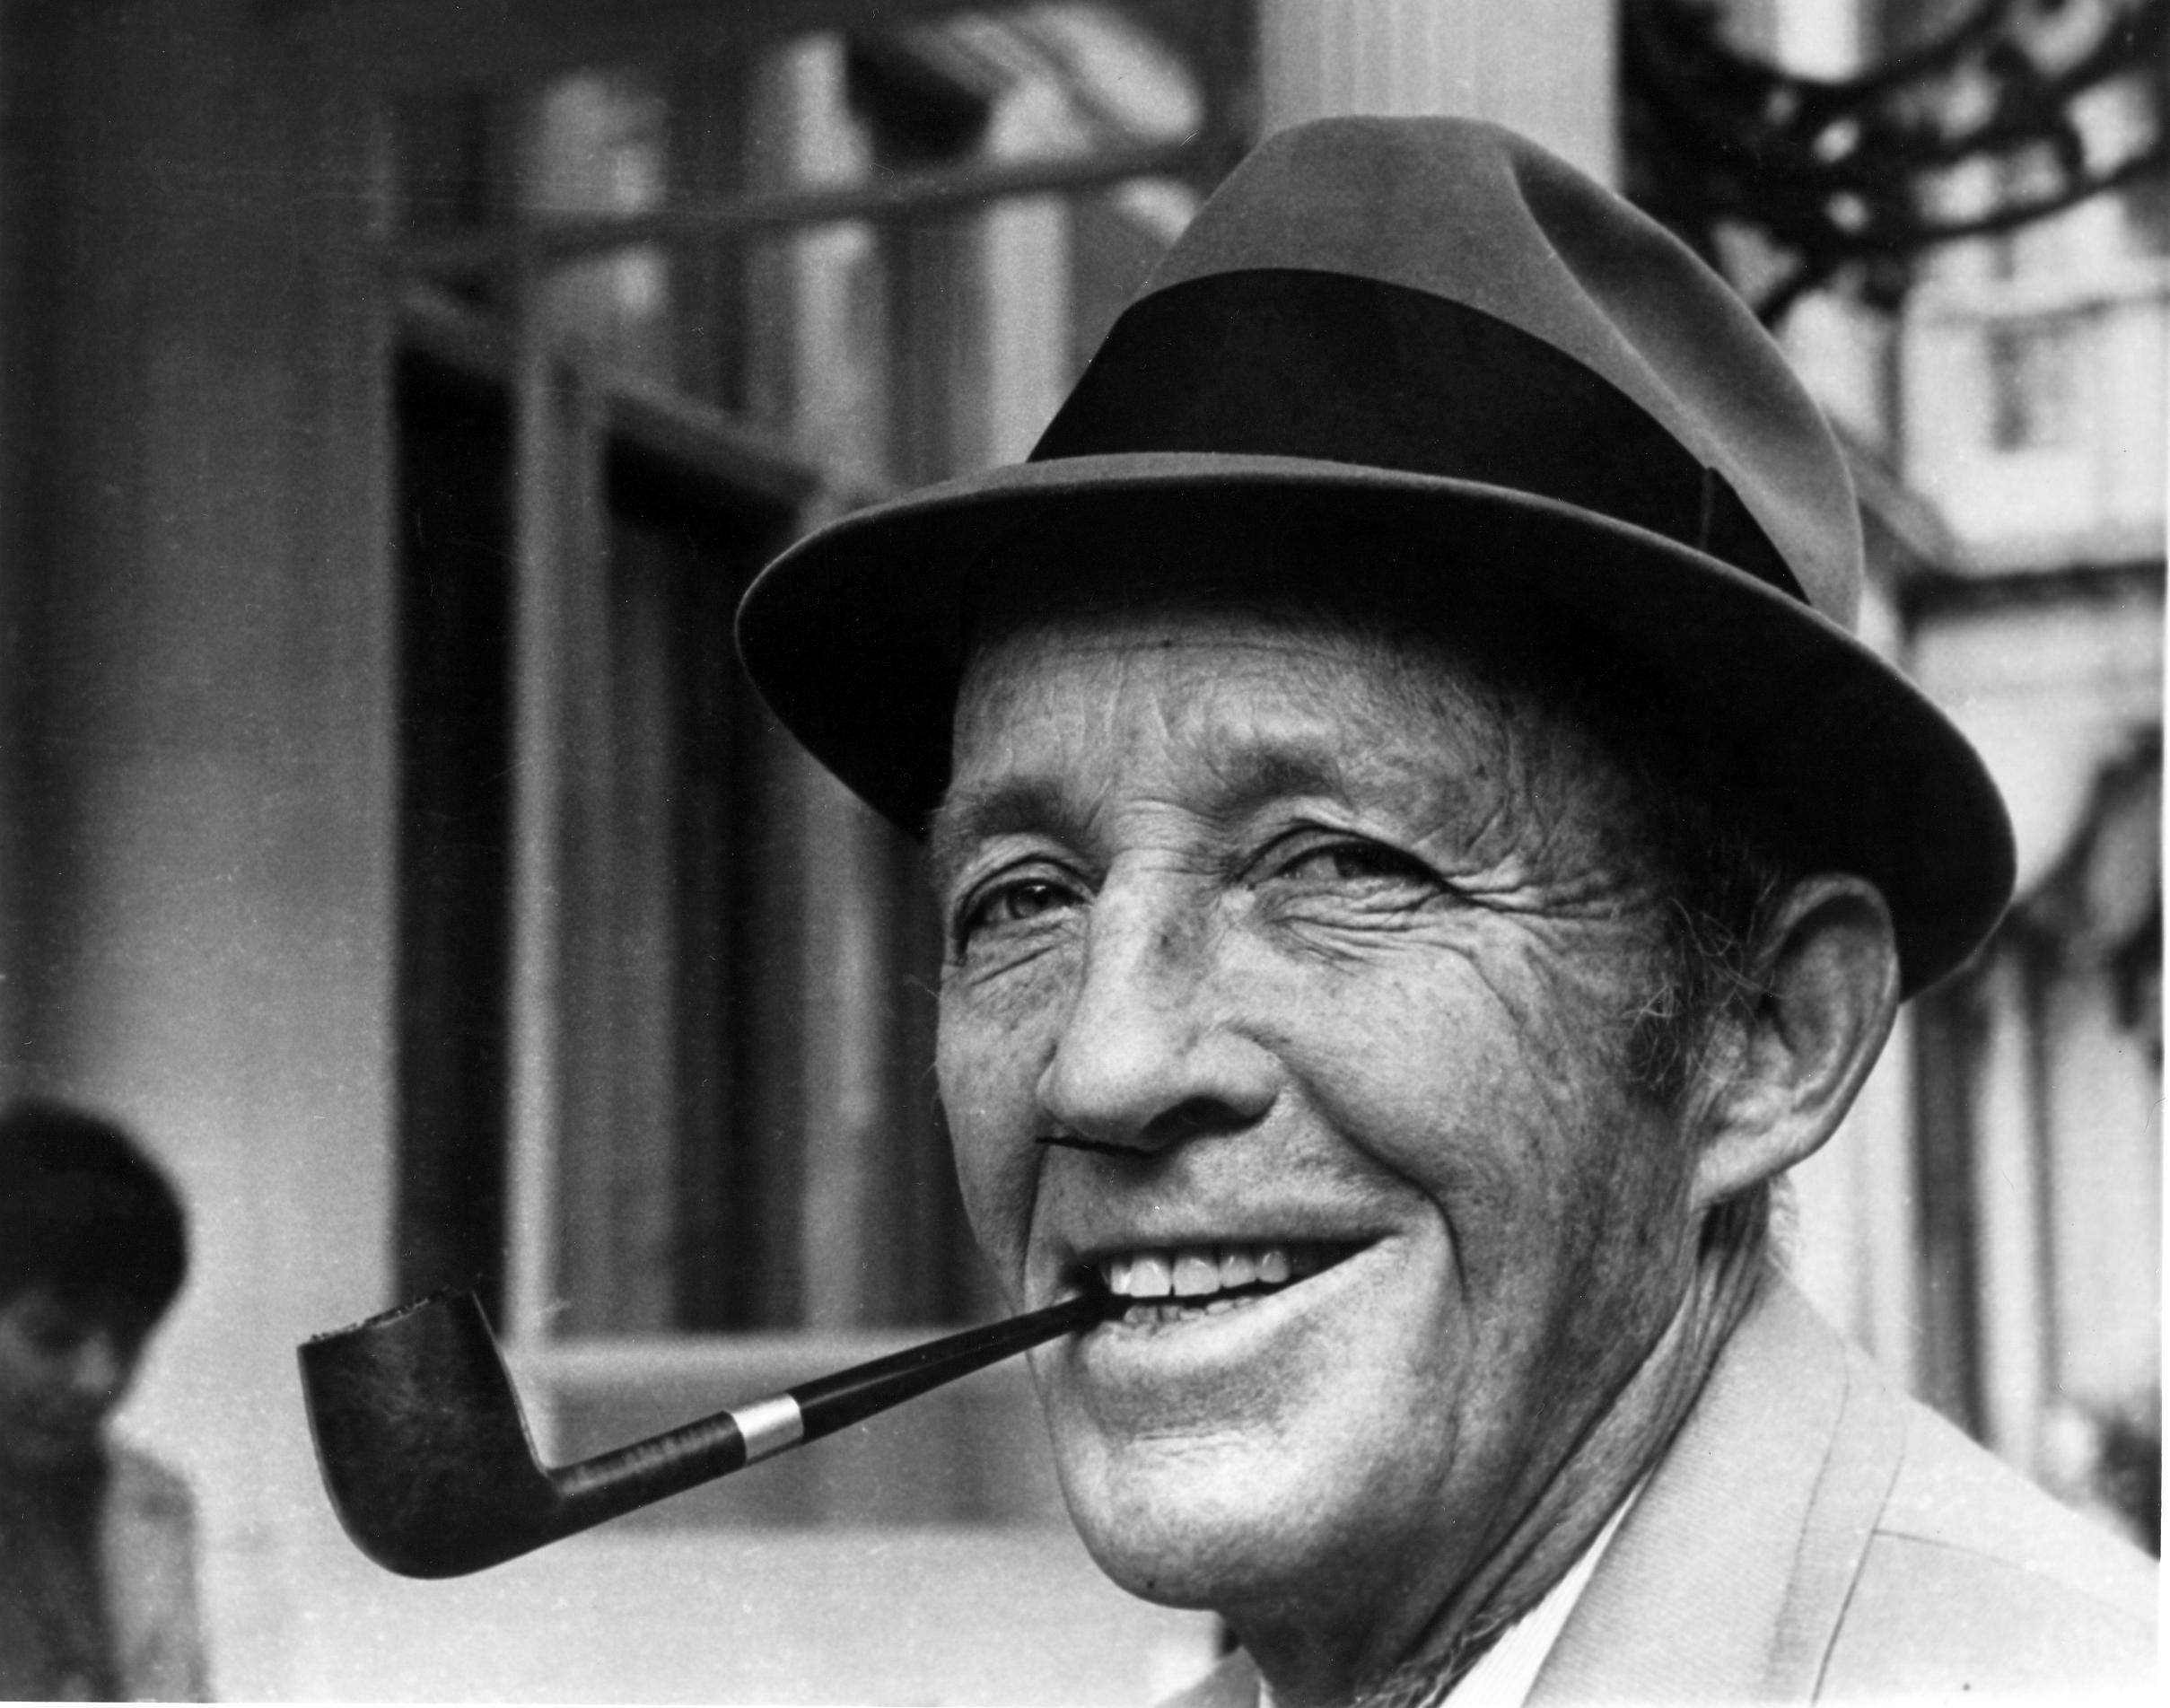 Bing Crosby - Legend Of Old California - Prairieland Lullaby